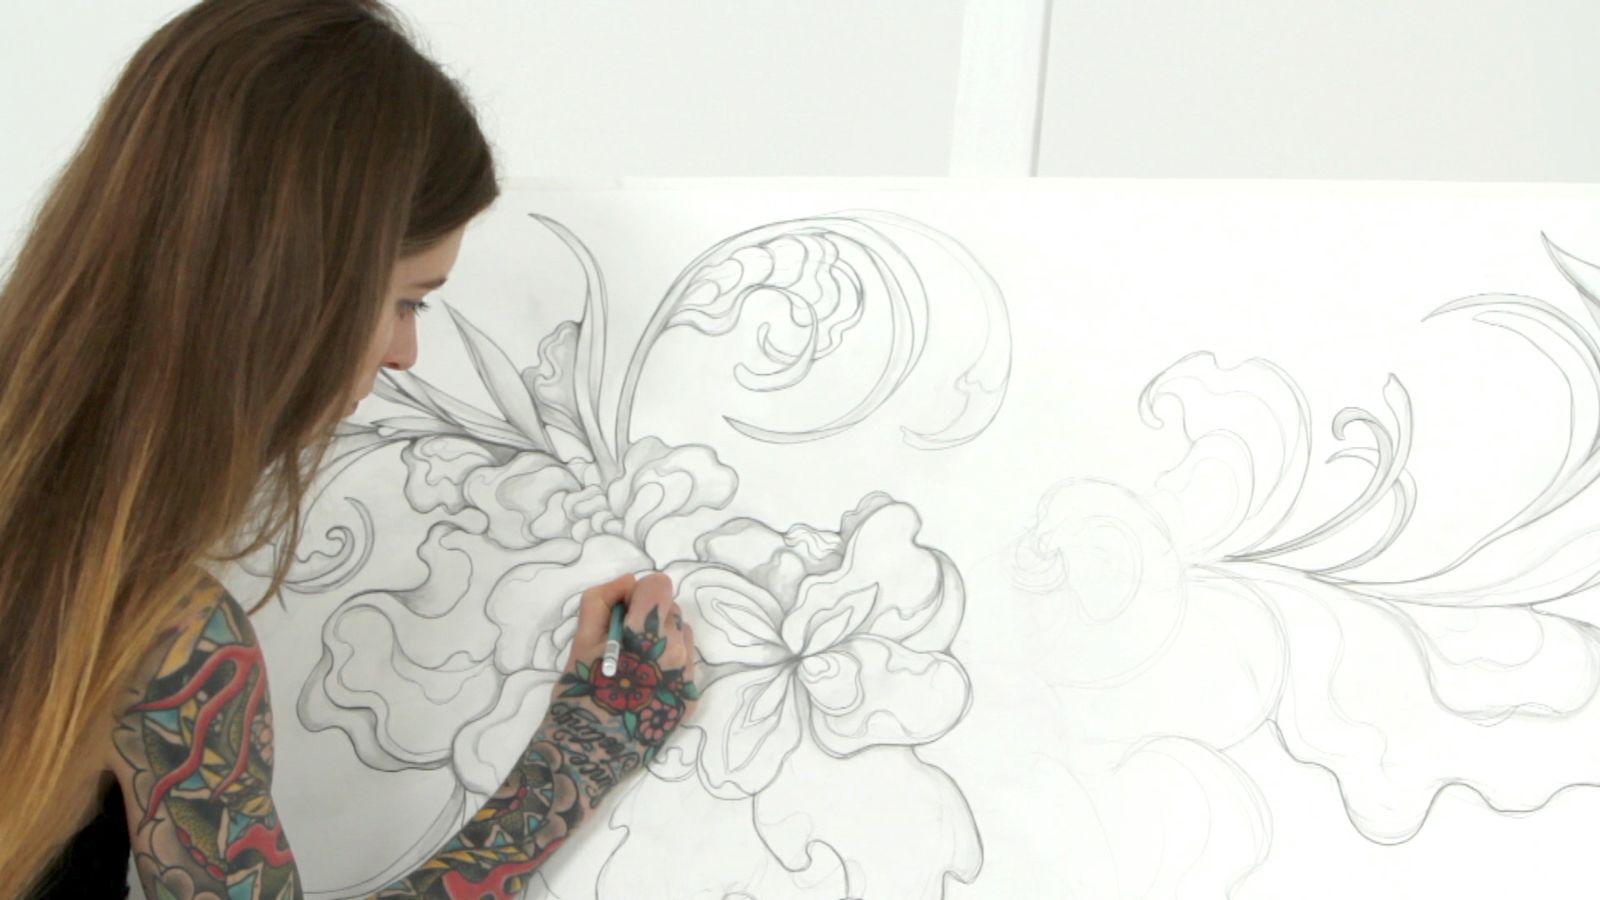 sara-blake-zso-ilustracao-design-arte-20